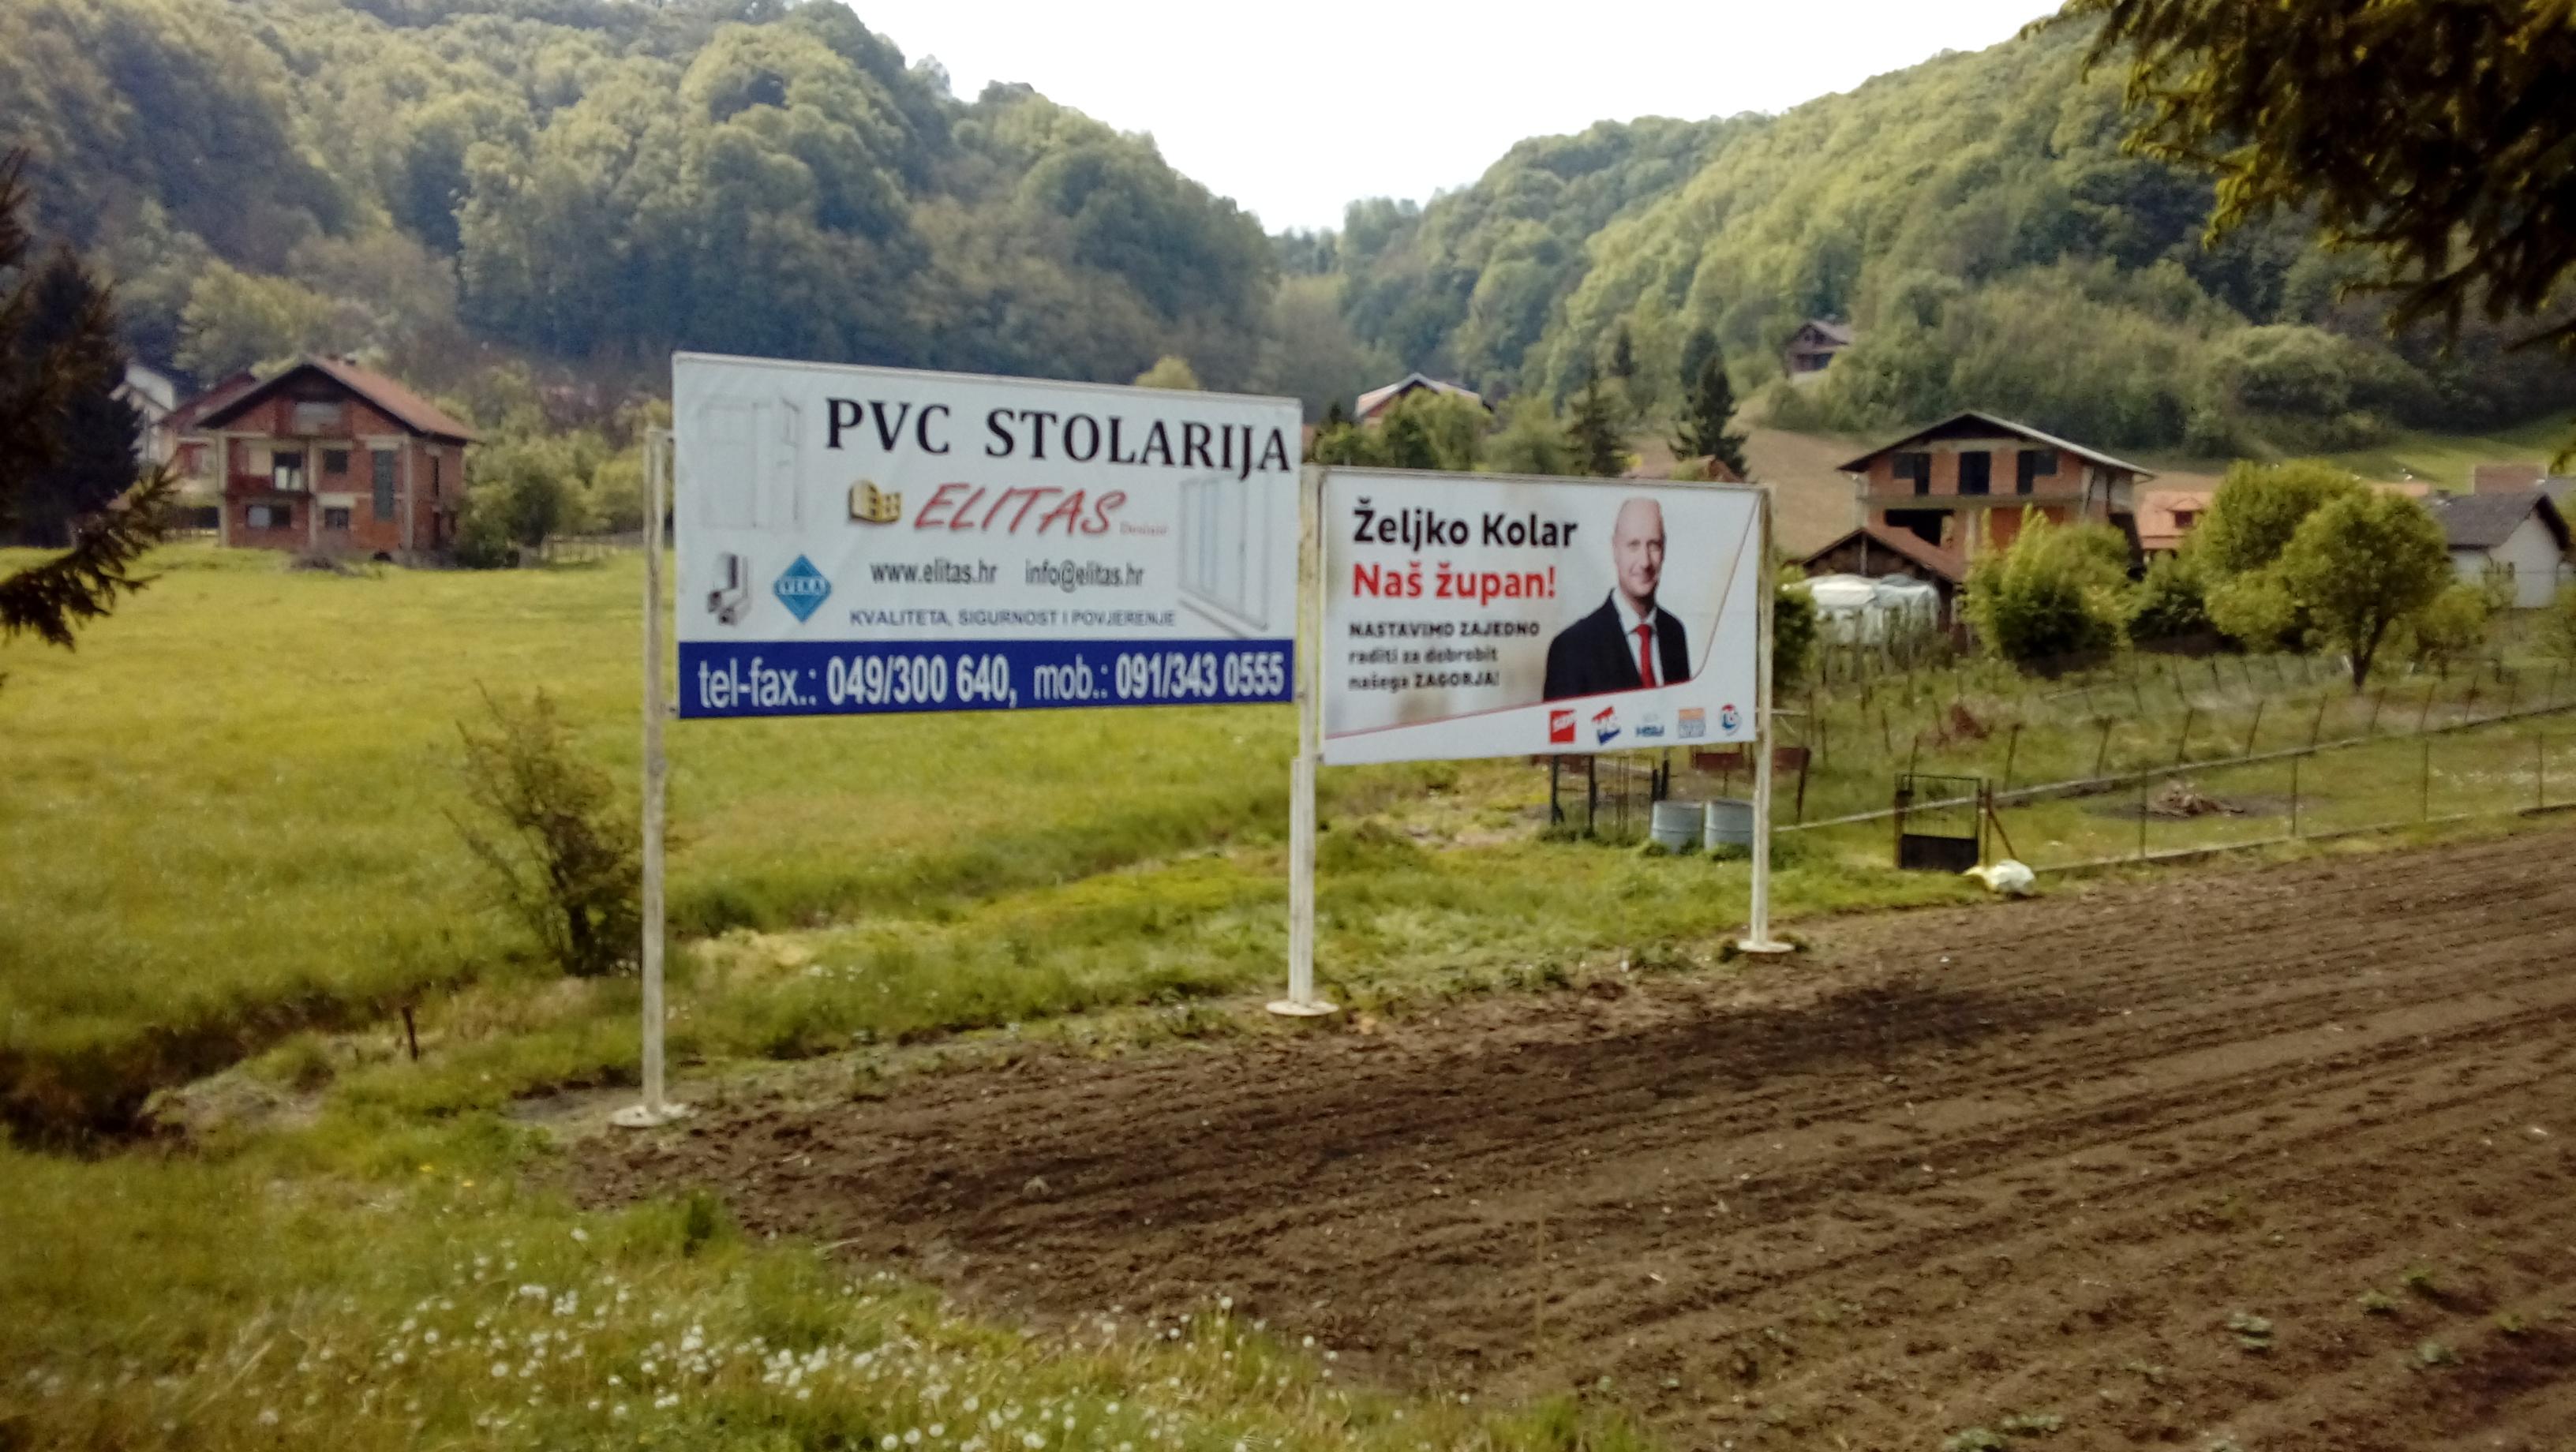 Pano Tuheljske Toplice - Željko Kolar - Naš župan!